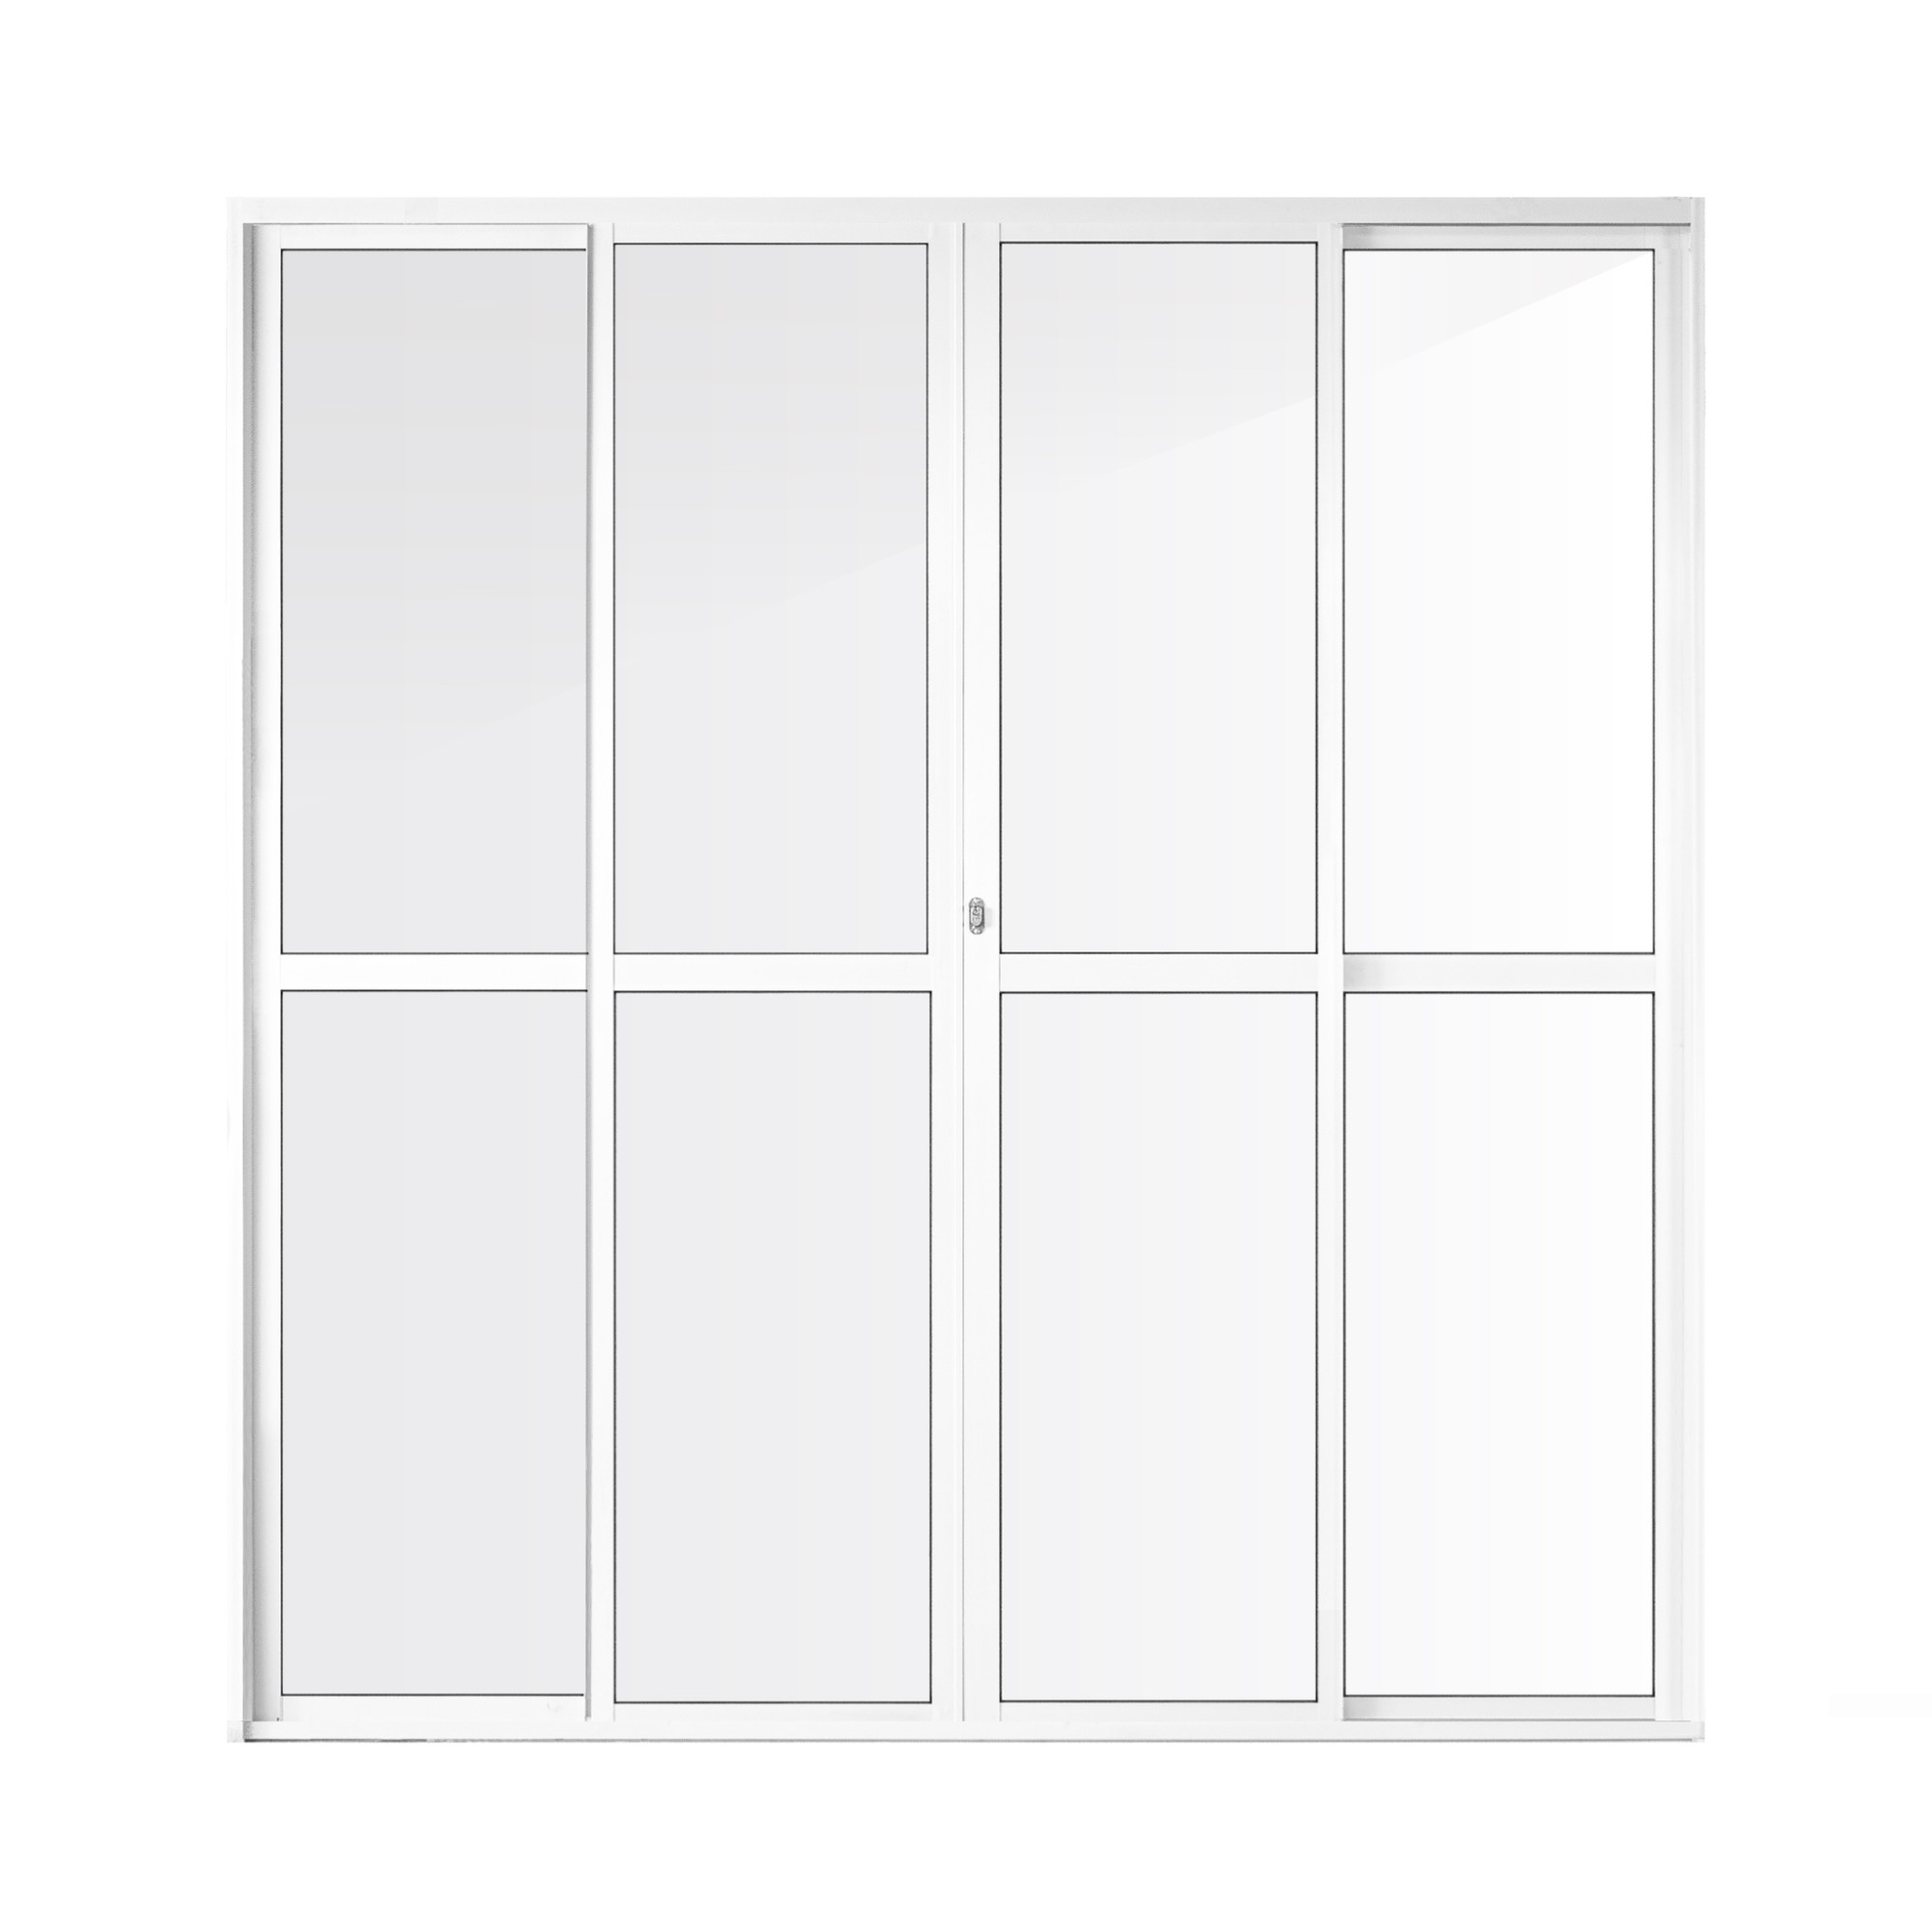 Porta Balcao de Aluminio 4 Folhas 210 x 200 cm Metalflex - Aluvid